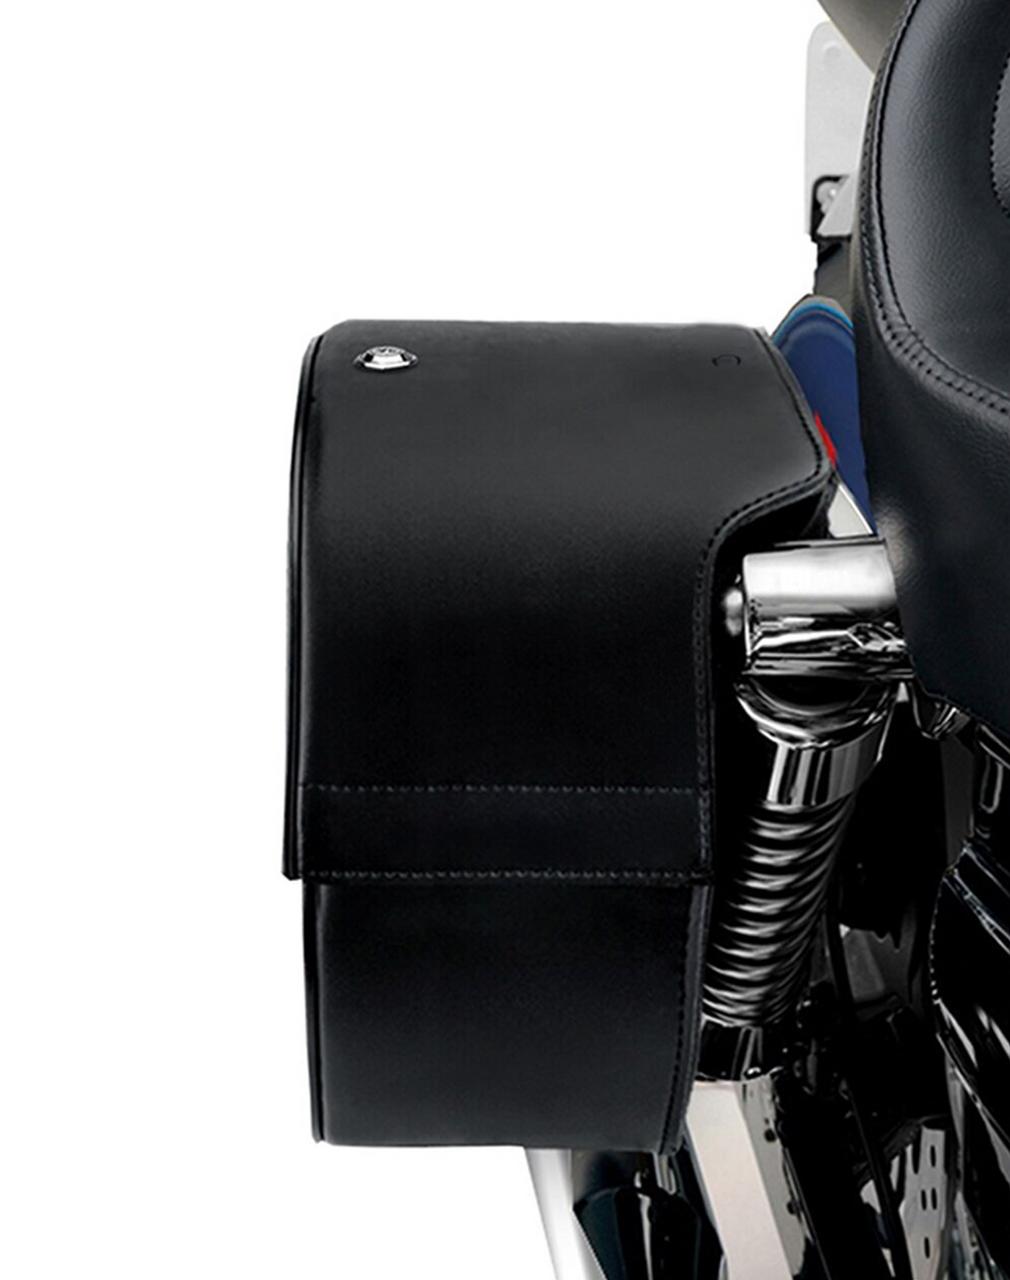 Honda 750 Shadow Phantom Large SS Shock Cutout Slanted Studded Motorcycle Saddlebags shock cutout view